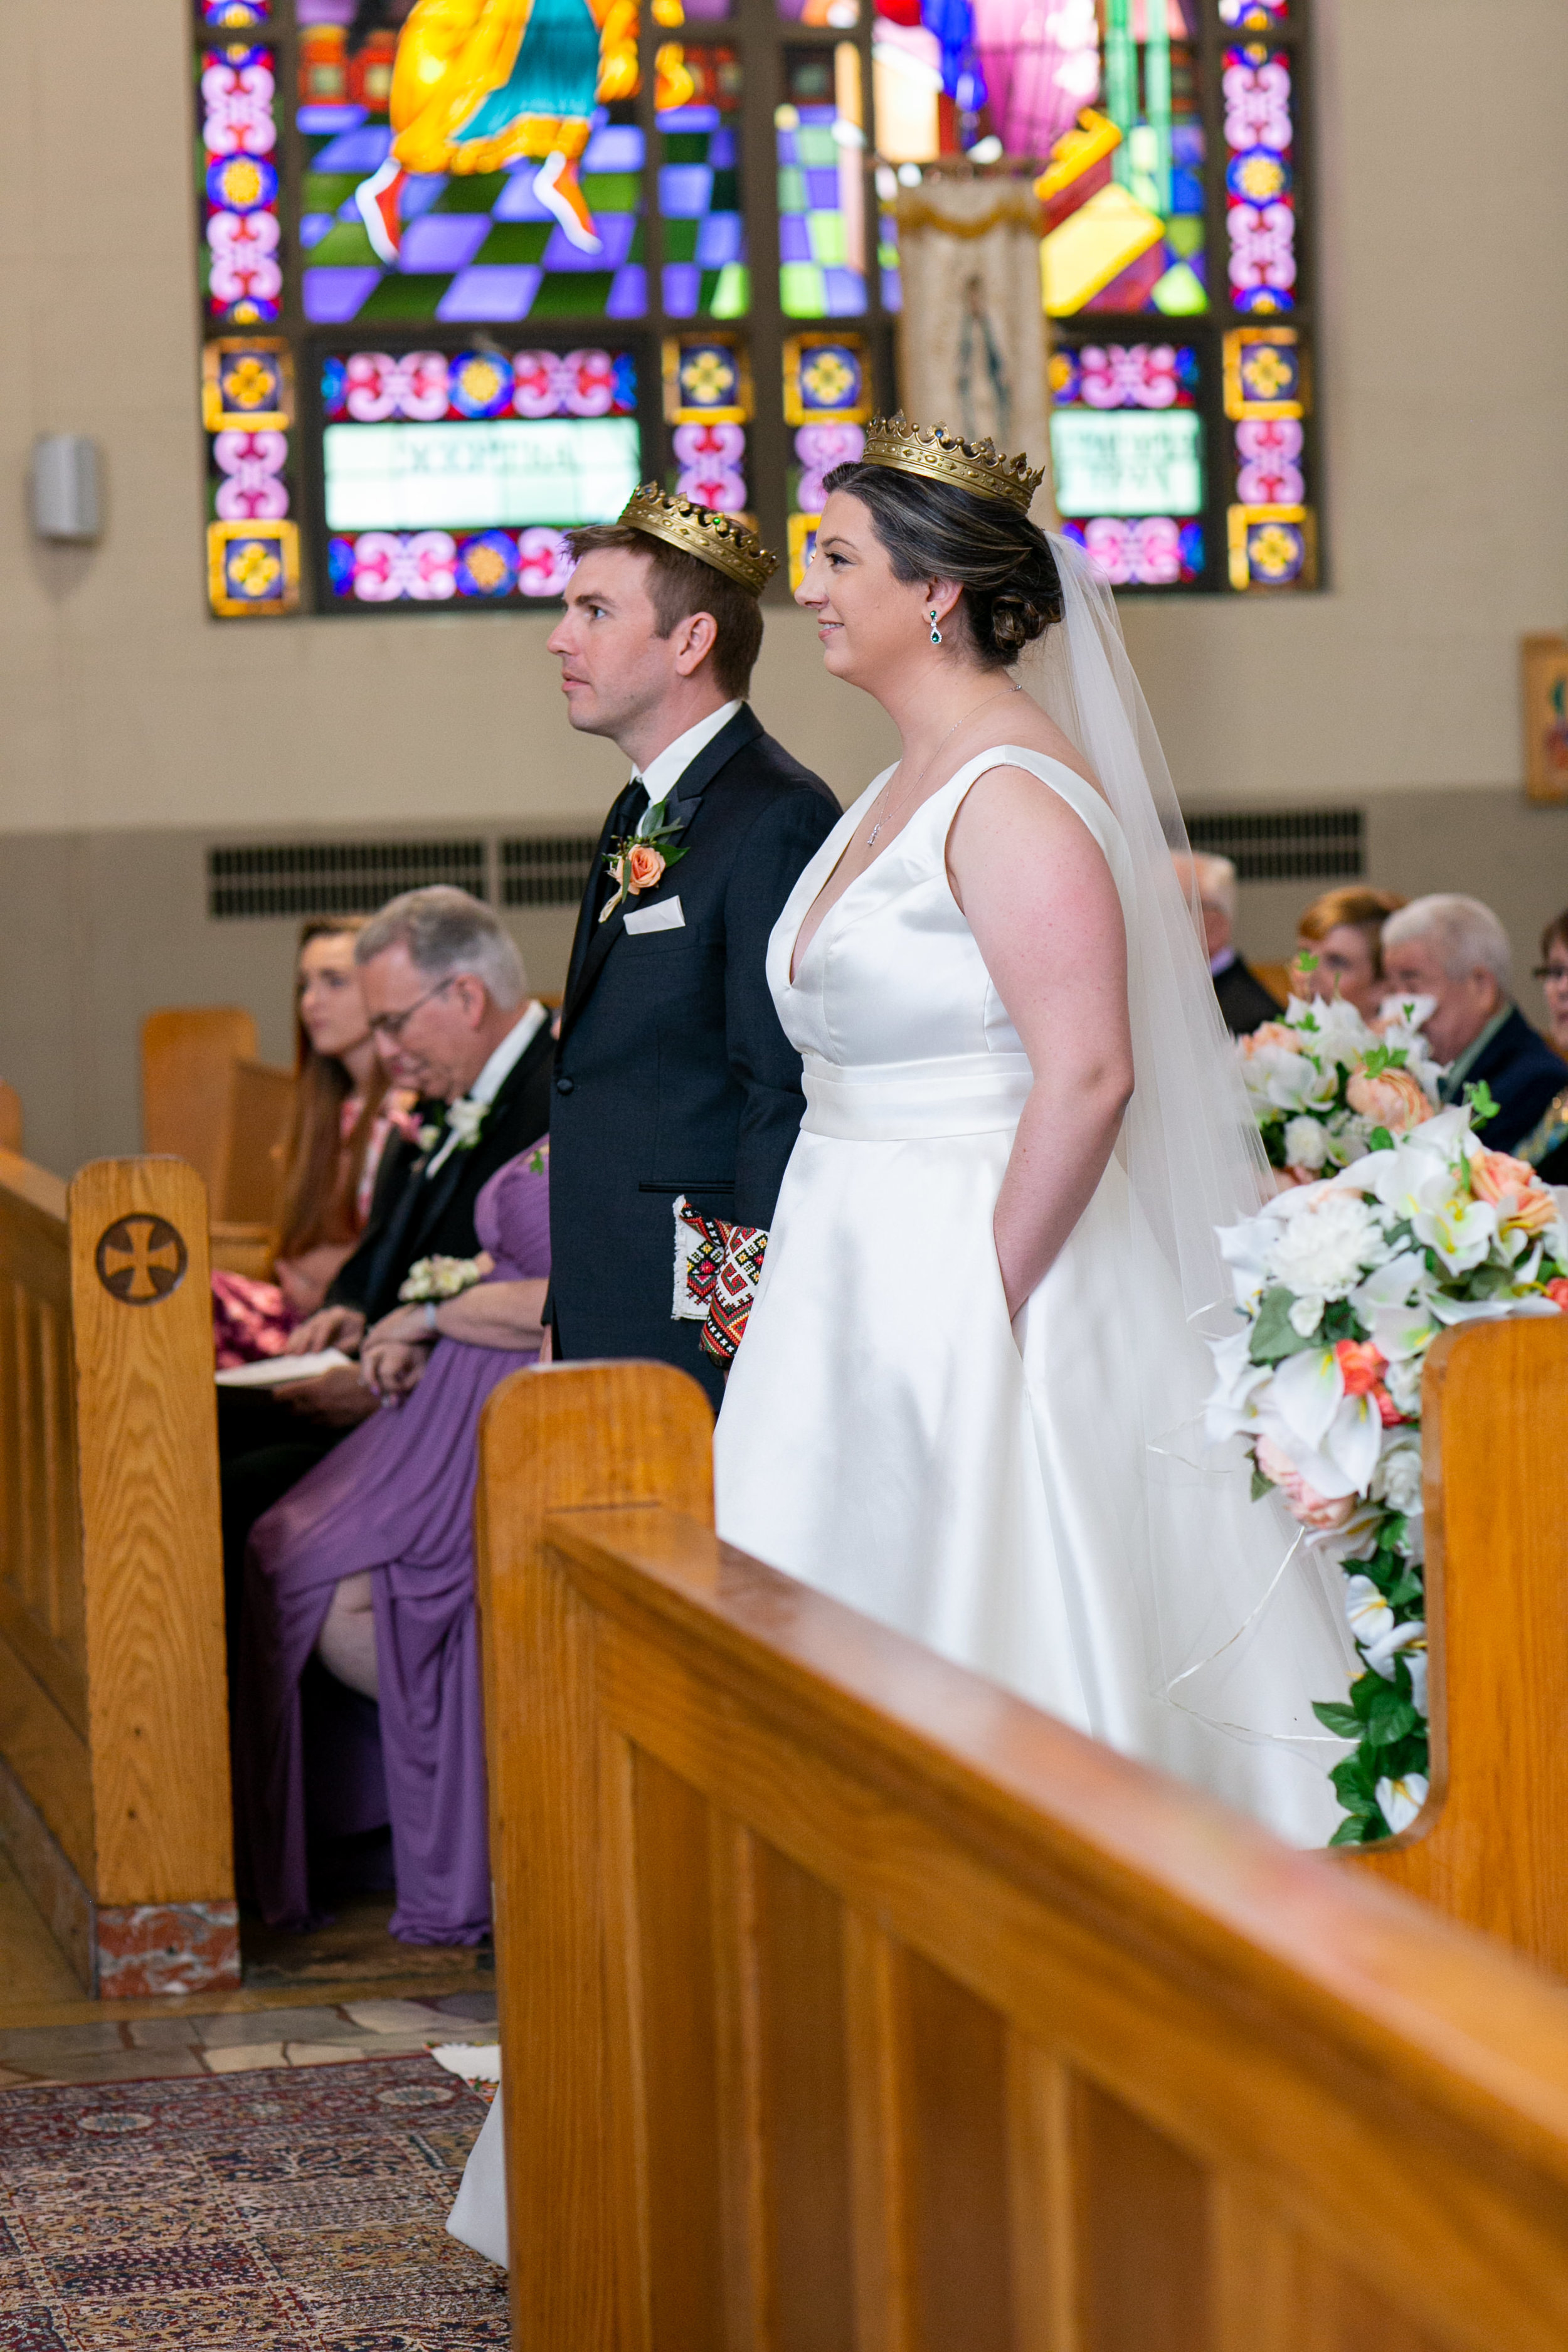 royal-wedding-photography0002.jpg